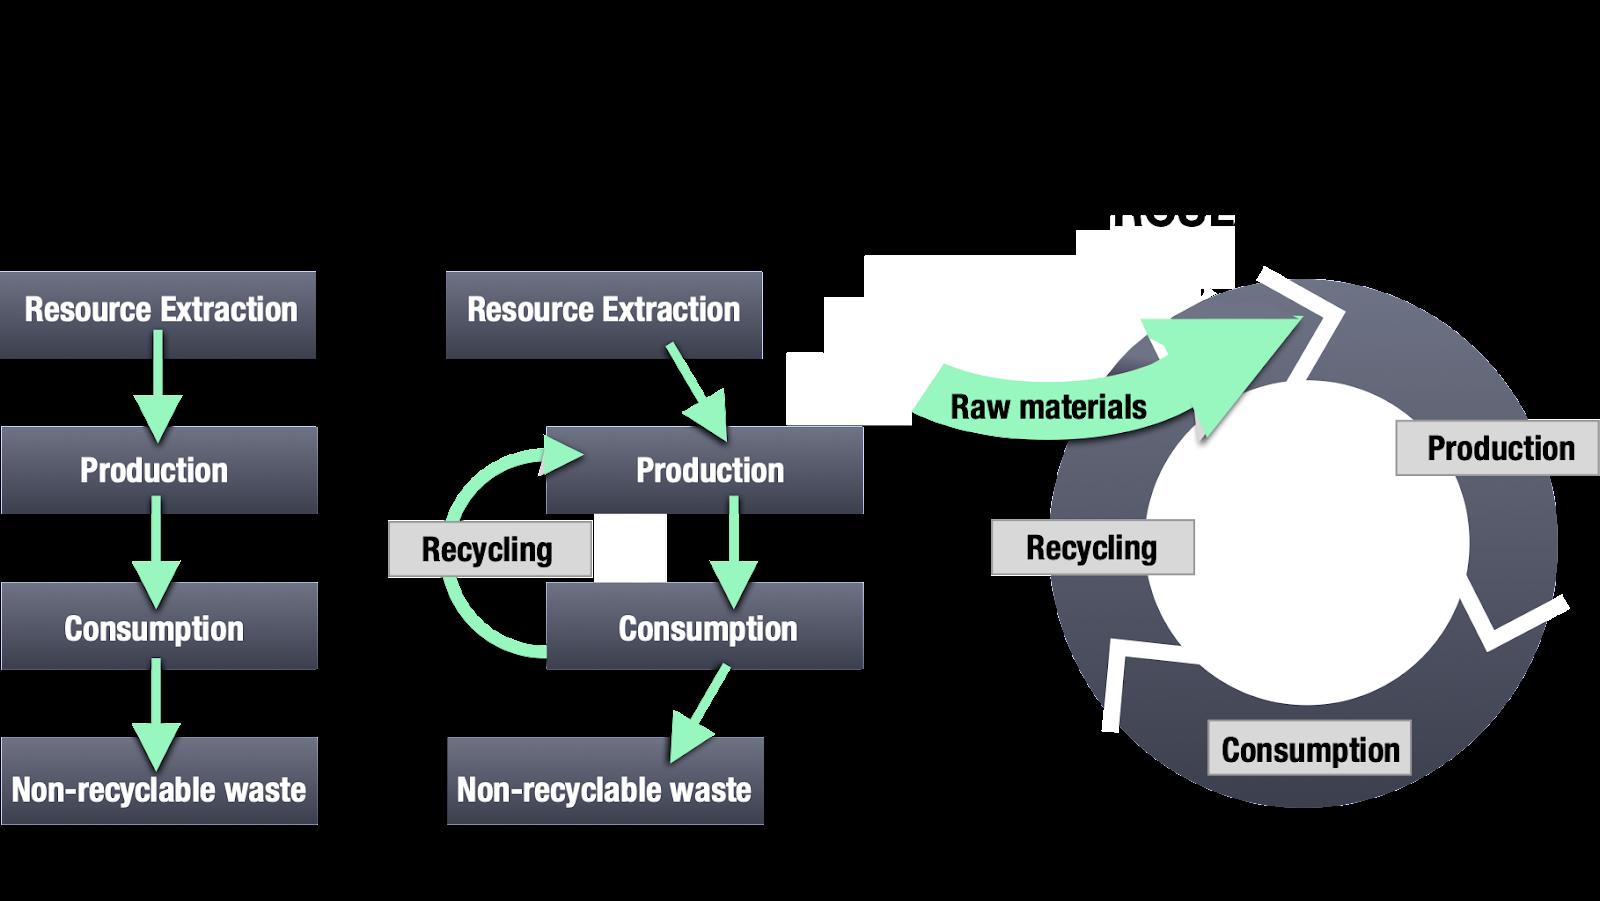 The Circular Economy Model